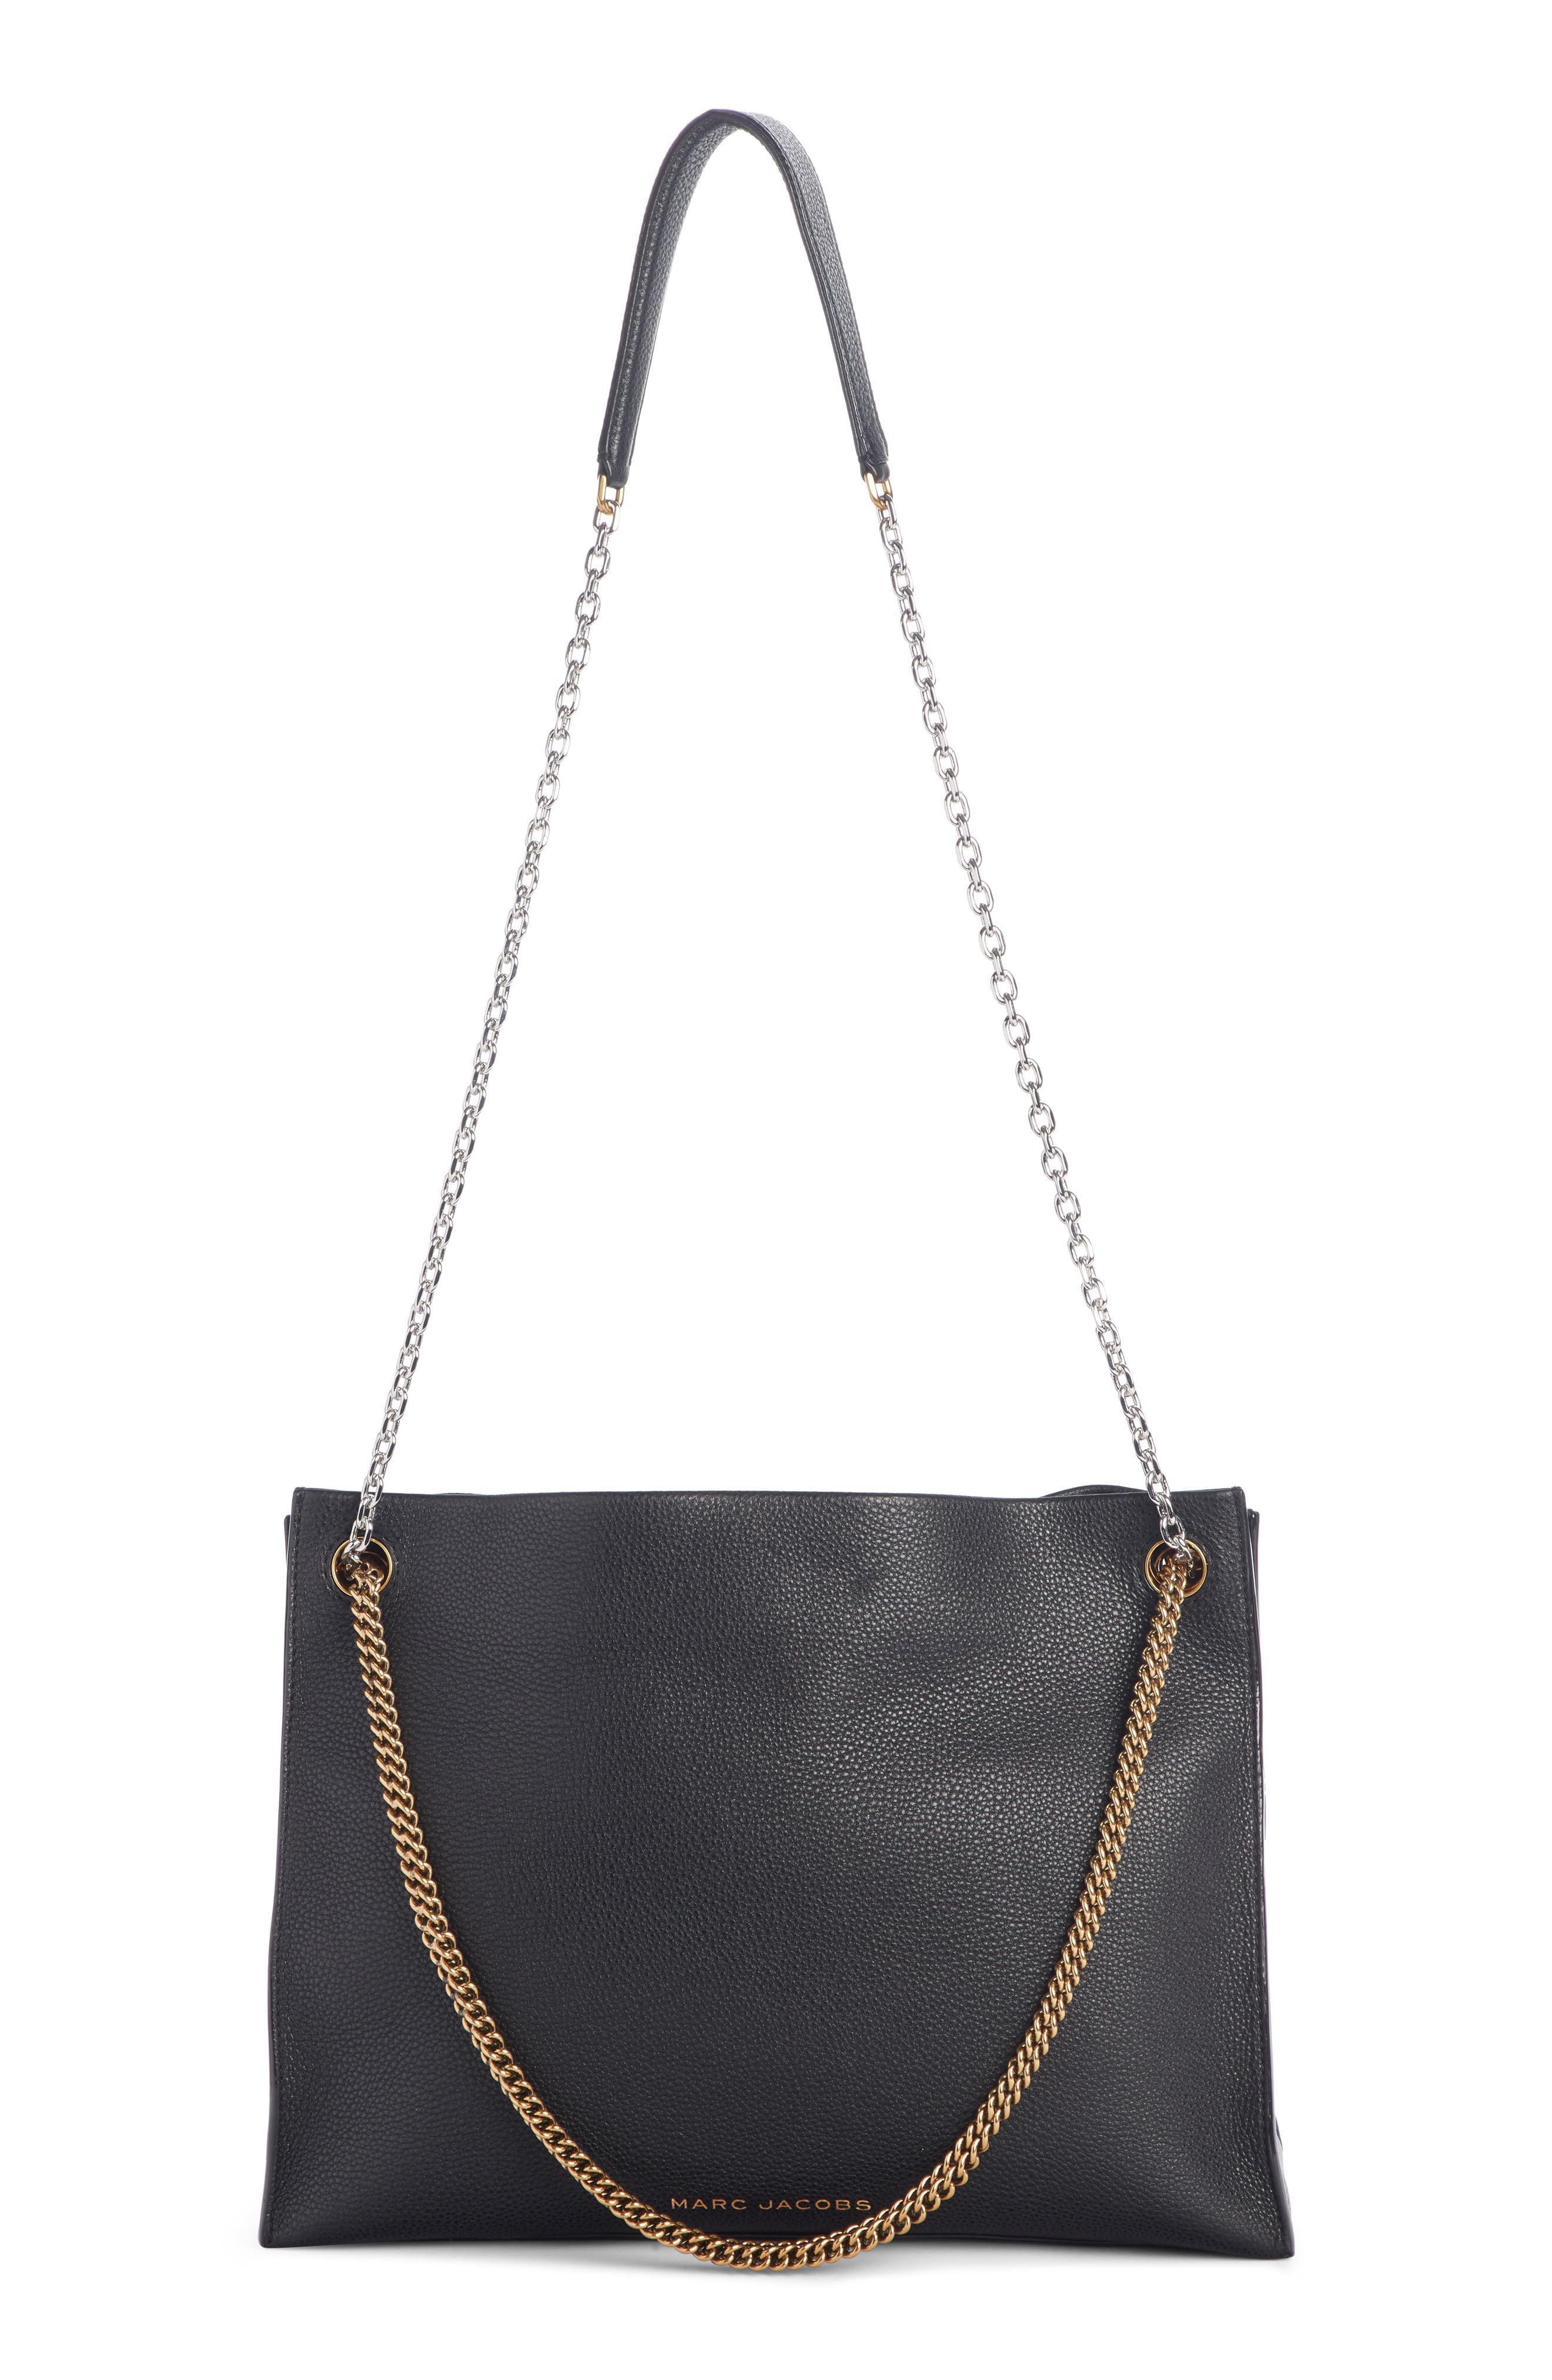 c8ae3ca6859f ... Black Double Link 34 Leather Shoulder Bag - - Lyst. View fullscreen